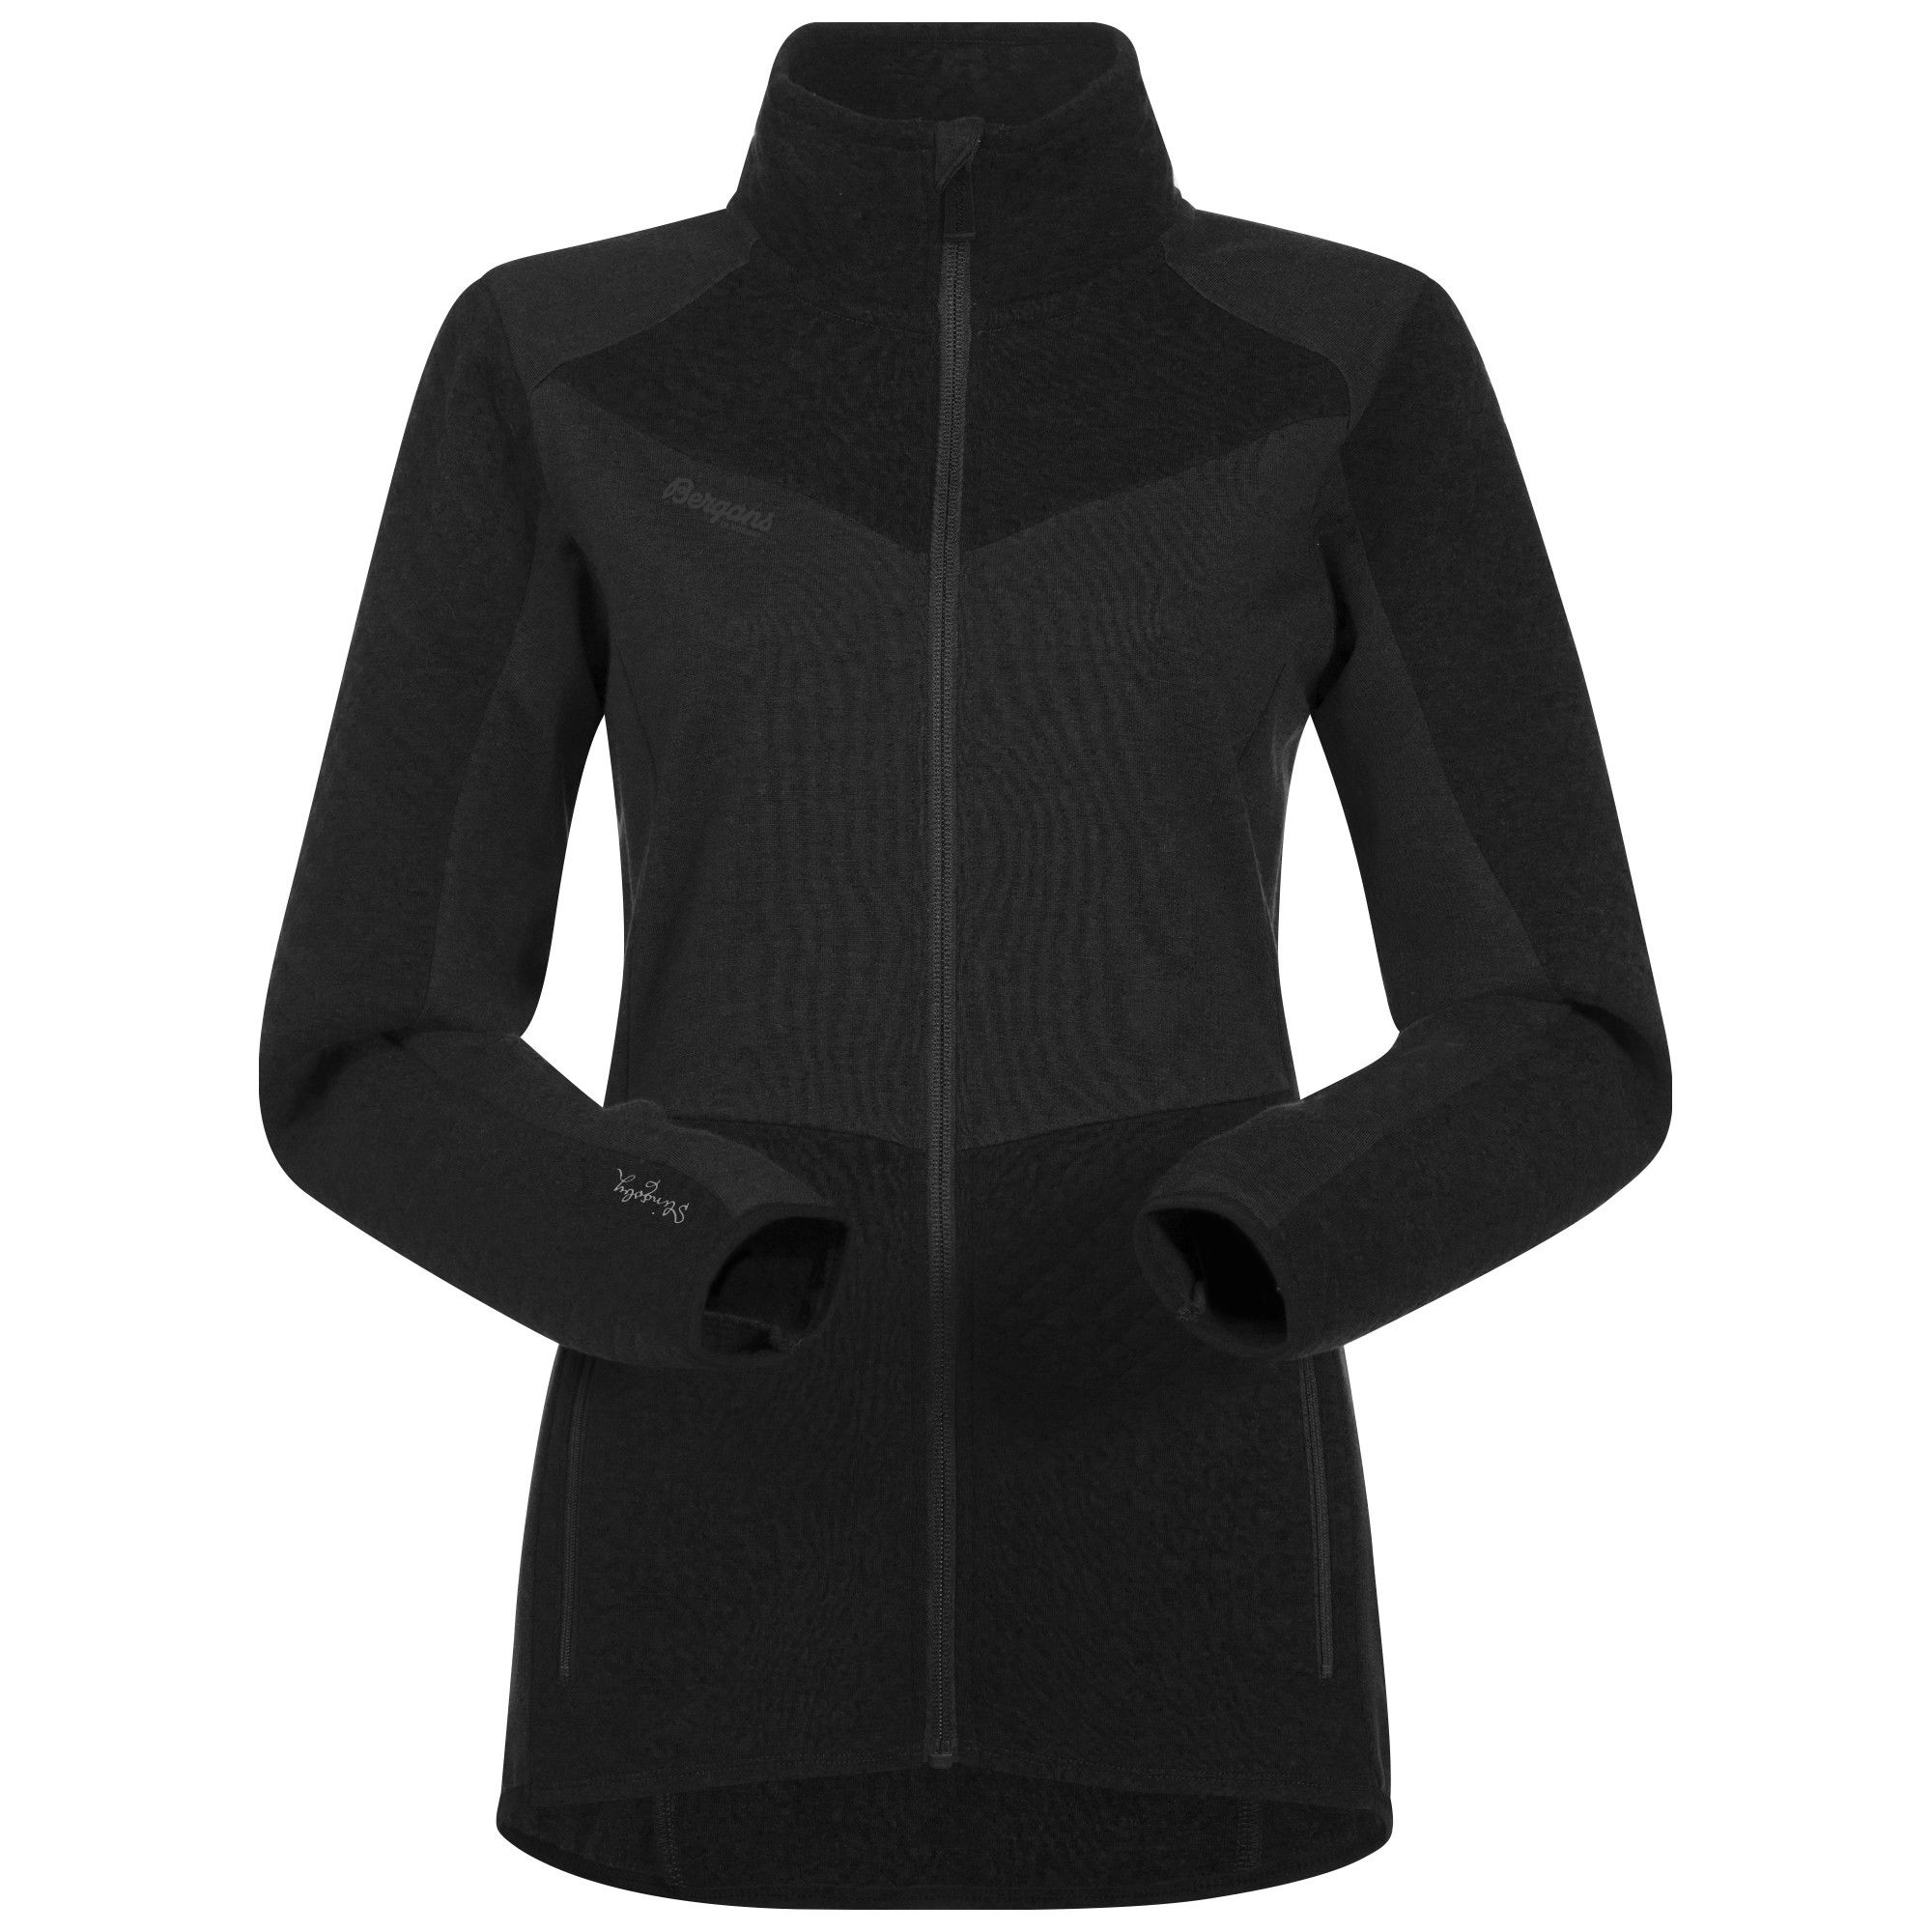 Bergans Middagstind Jacket Schwarz, Female Merino Mens -Farbe Black, M